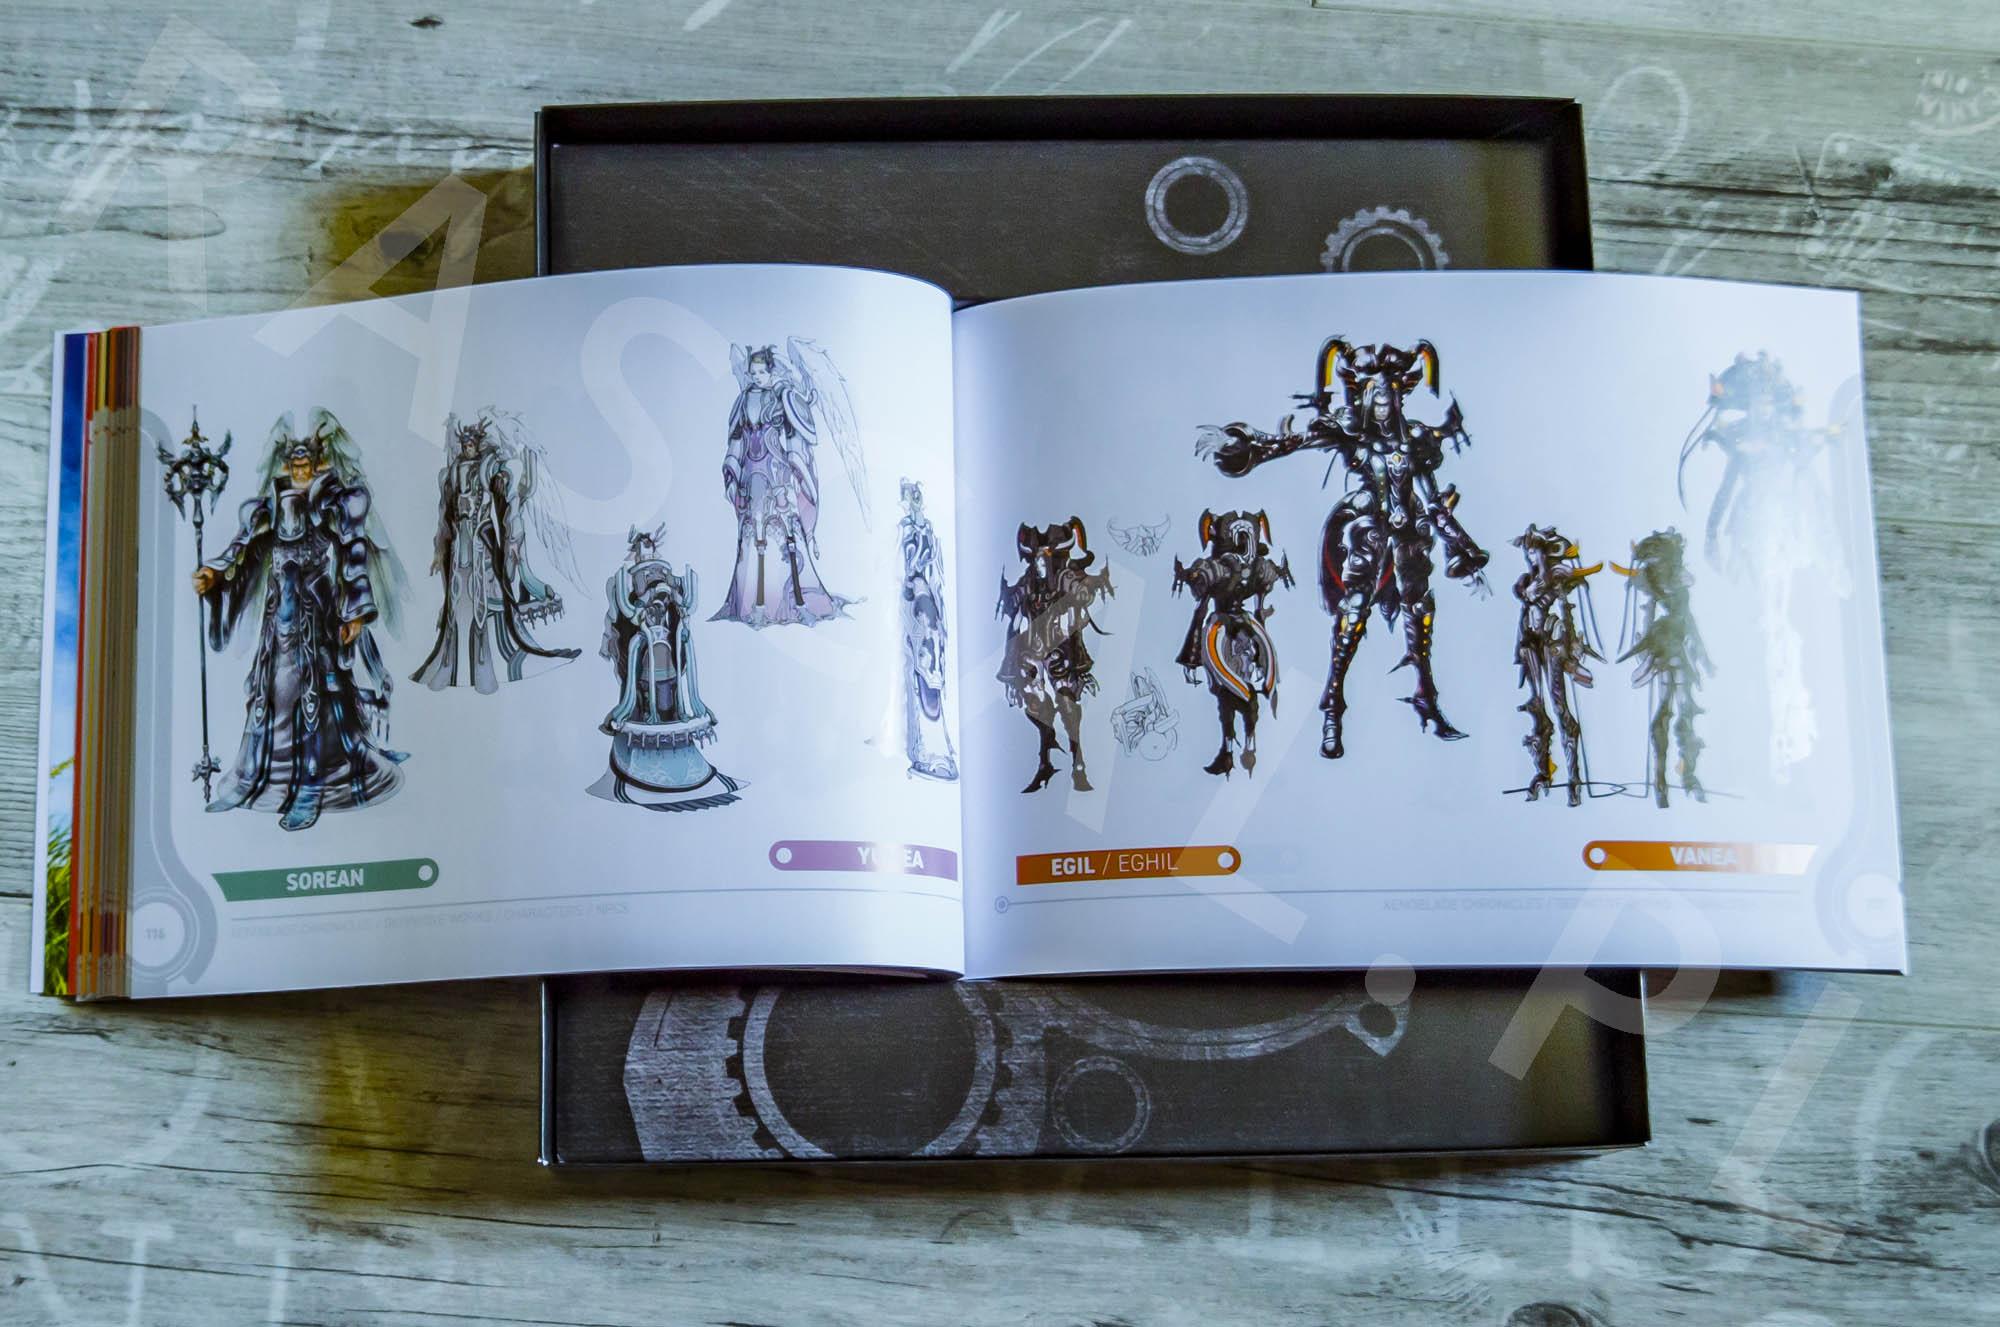 Xenoblade Chronicles Definitive Edition Collectors Set - Artbook - 12